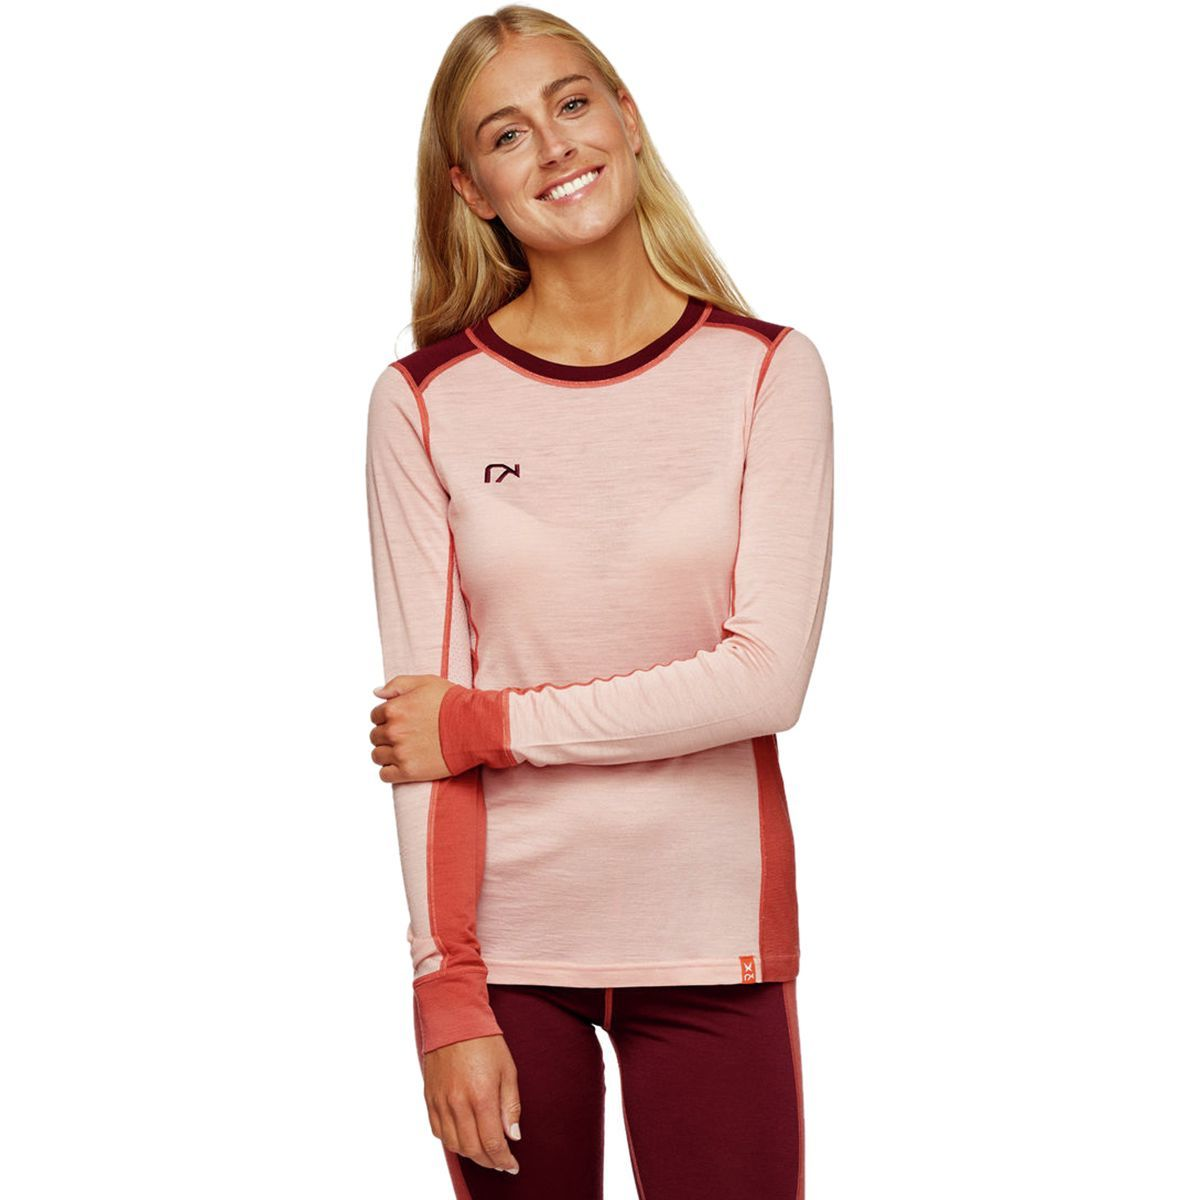 Kari Traa Tikse Long-Sleeve Top - Women's